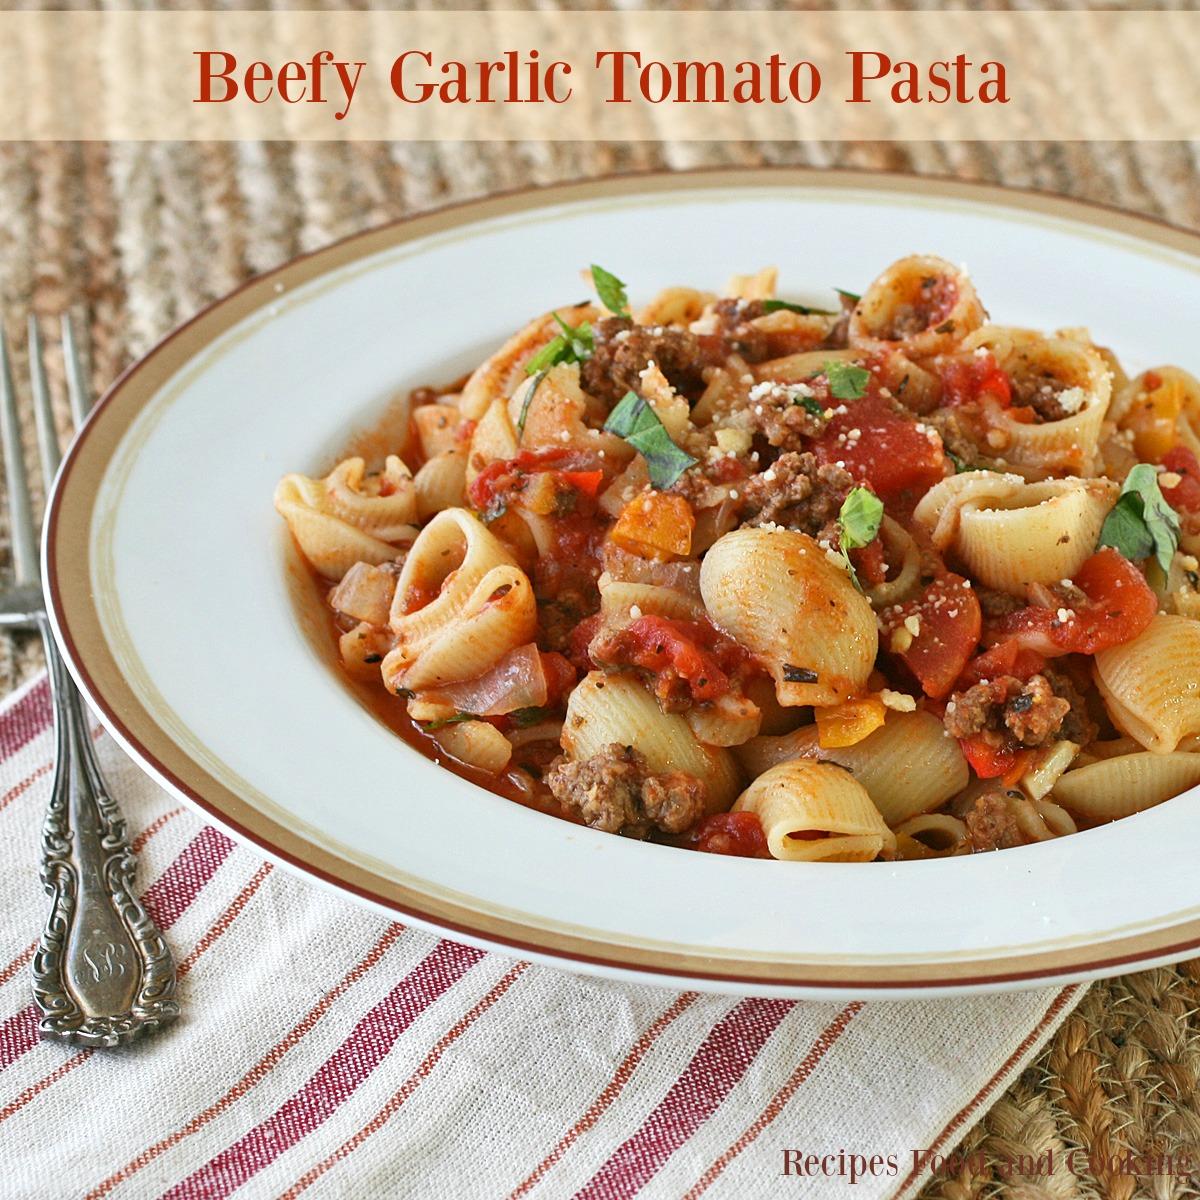 Beefy Garlic Tomato Pasta